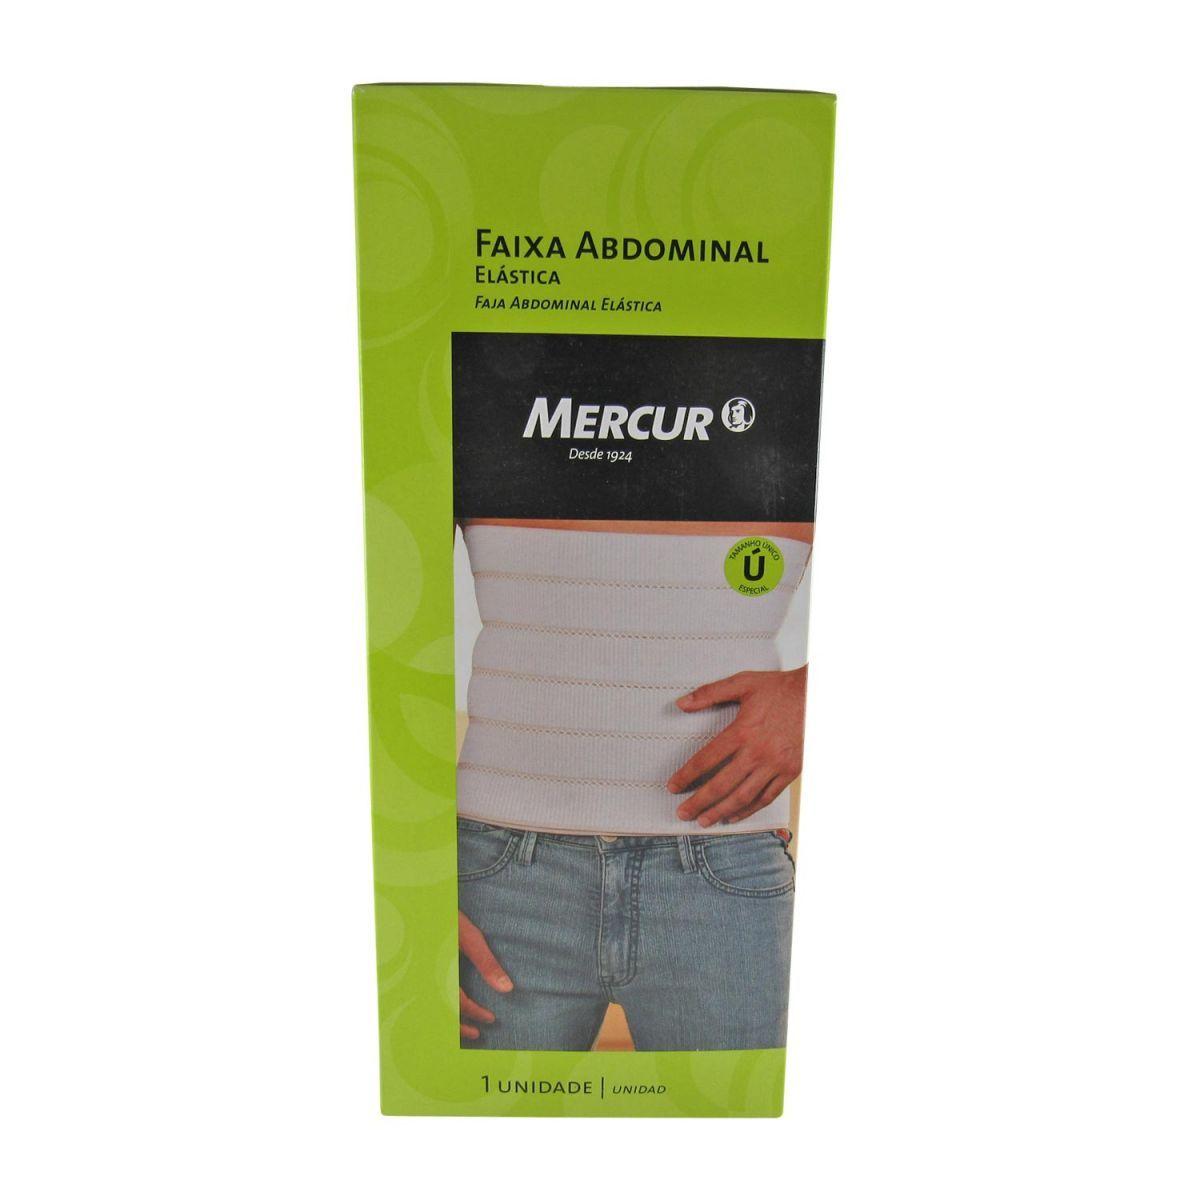 Faixa Abdominal Elástica 30cmx1,4m Especial Mercur